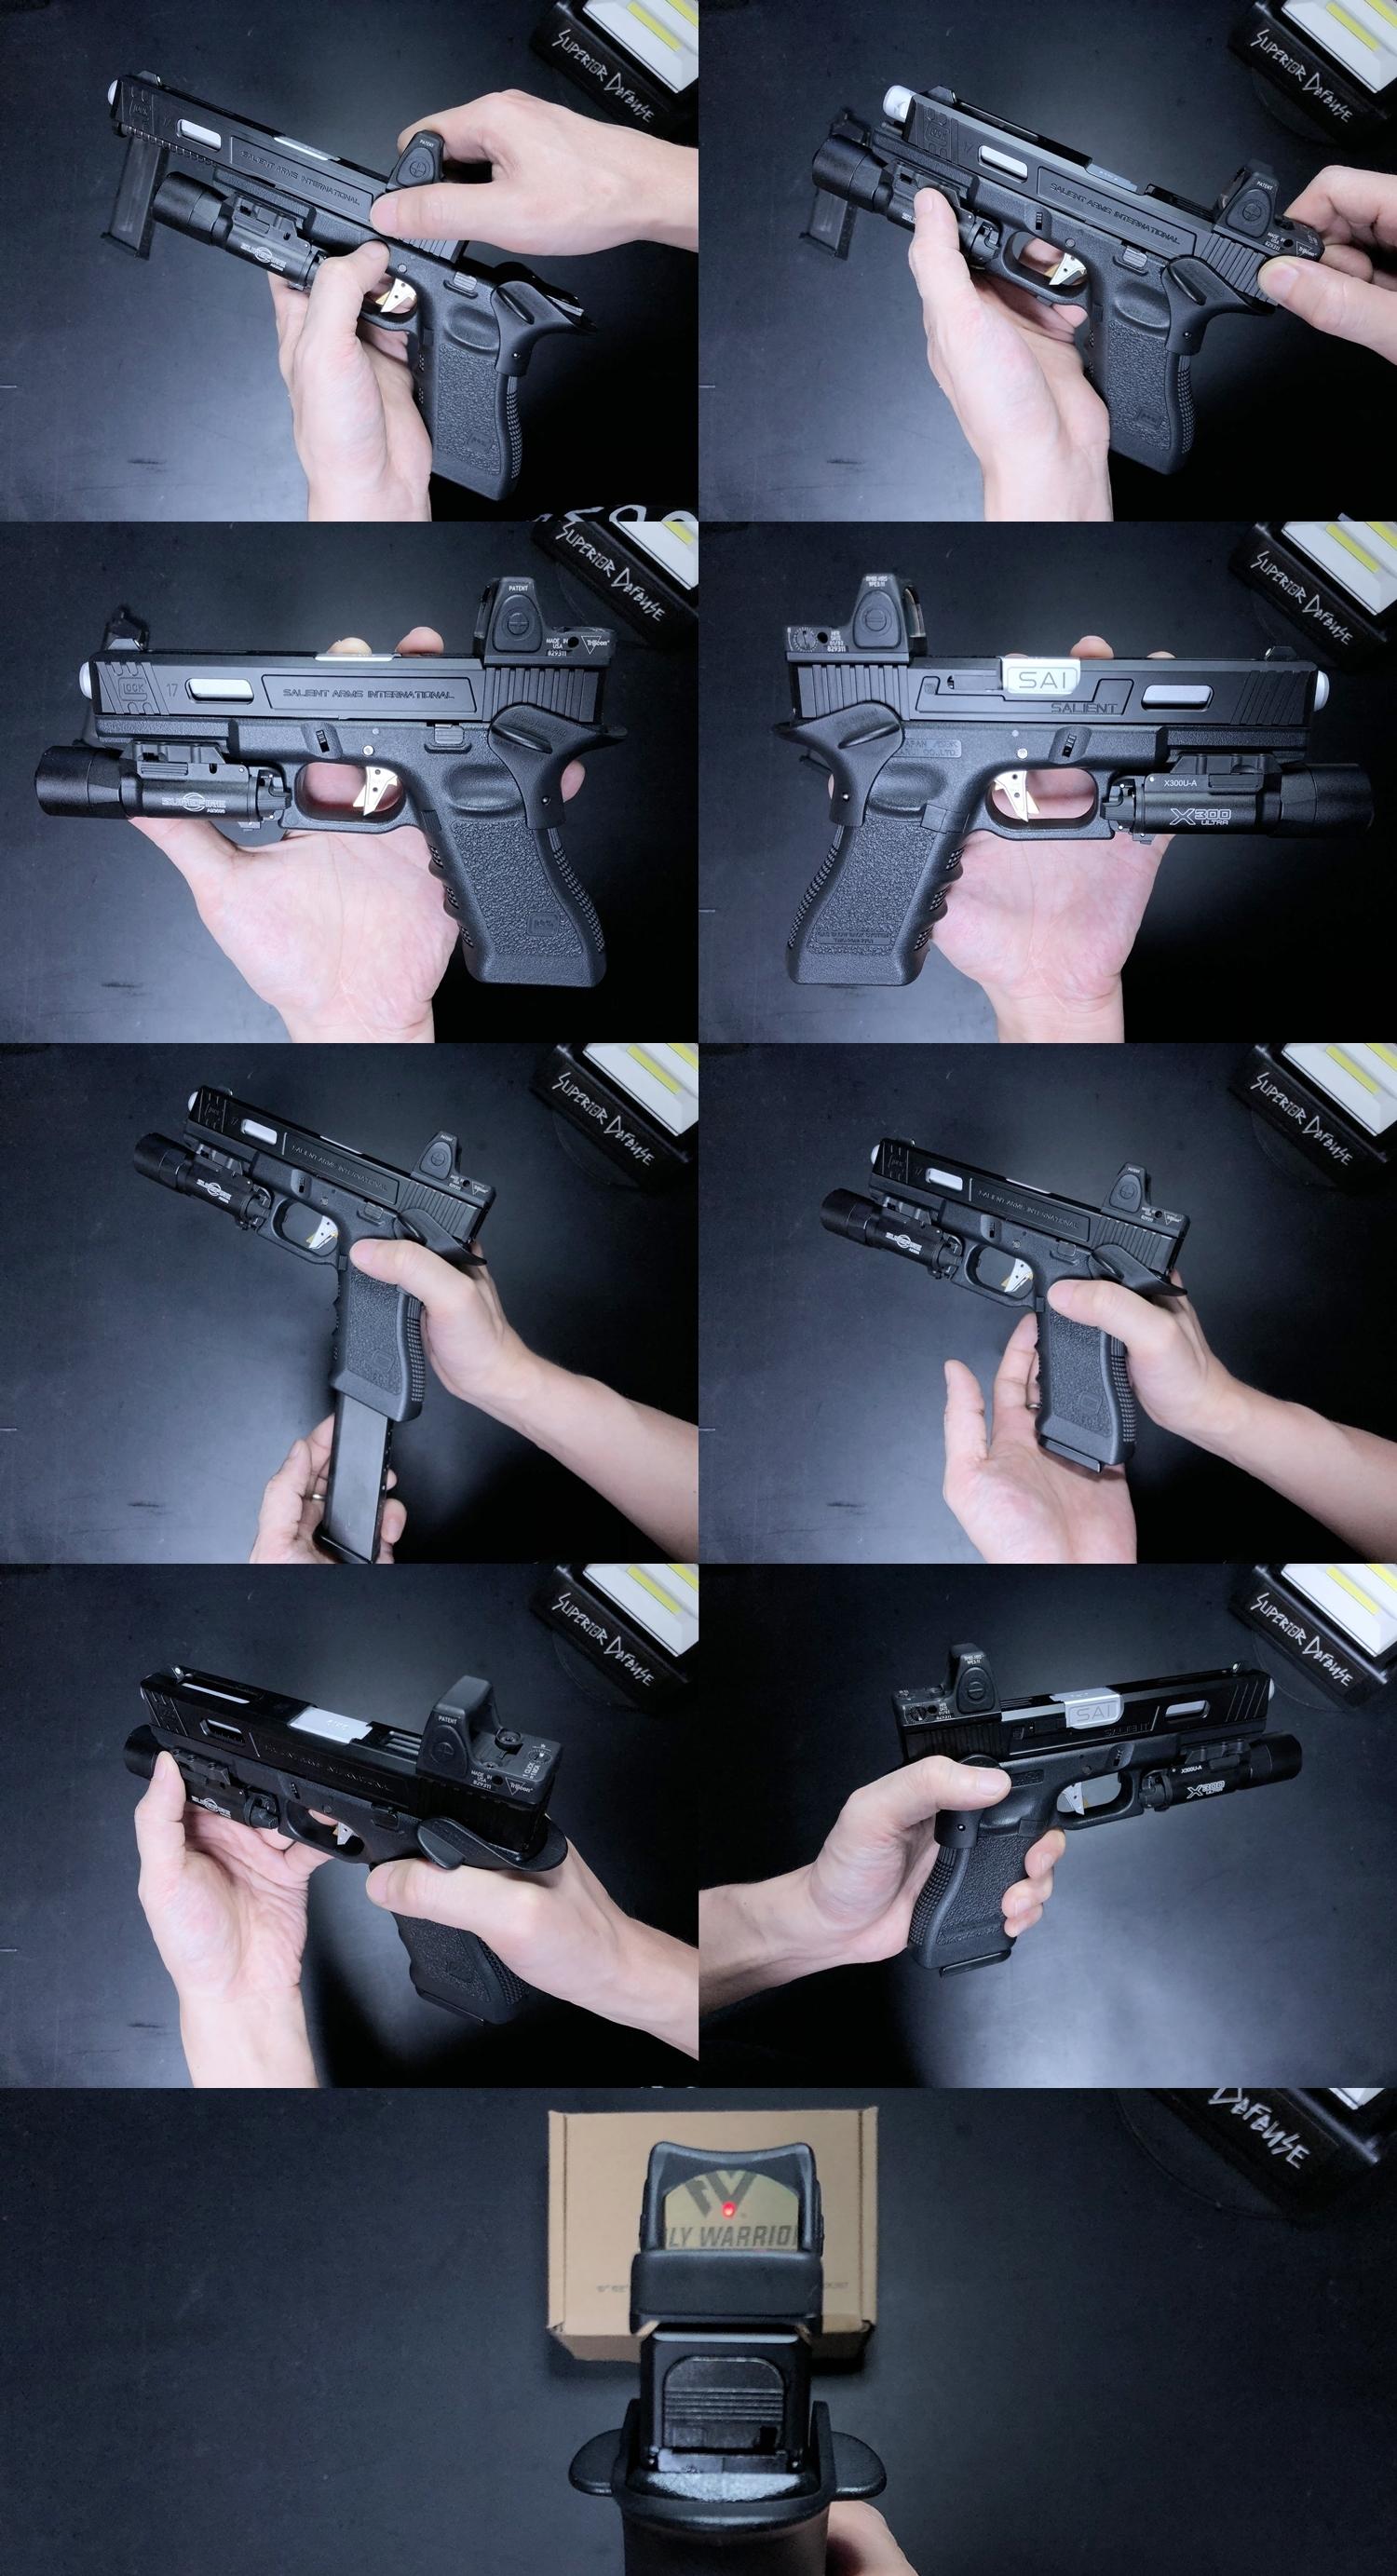 11 HolyWarrior製 RMR Trijicon Type ドットサイト GET!! 噂のHW製 最新 超軽量 複合材質 樹脂 タイプを購入したけど速攻で仲間に奪われました(笑)!! Glock G17 GBB カスタム!! 購入 開封 取付 加工 レビュー!!